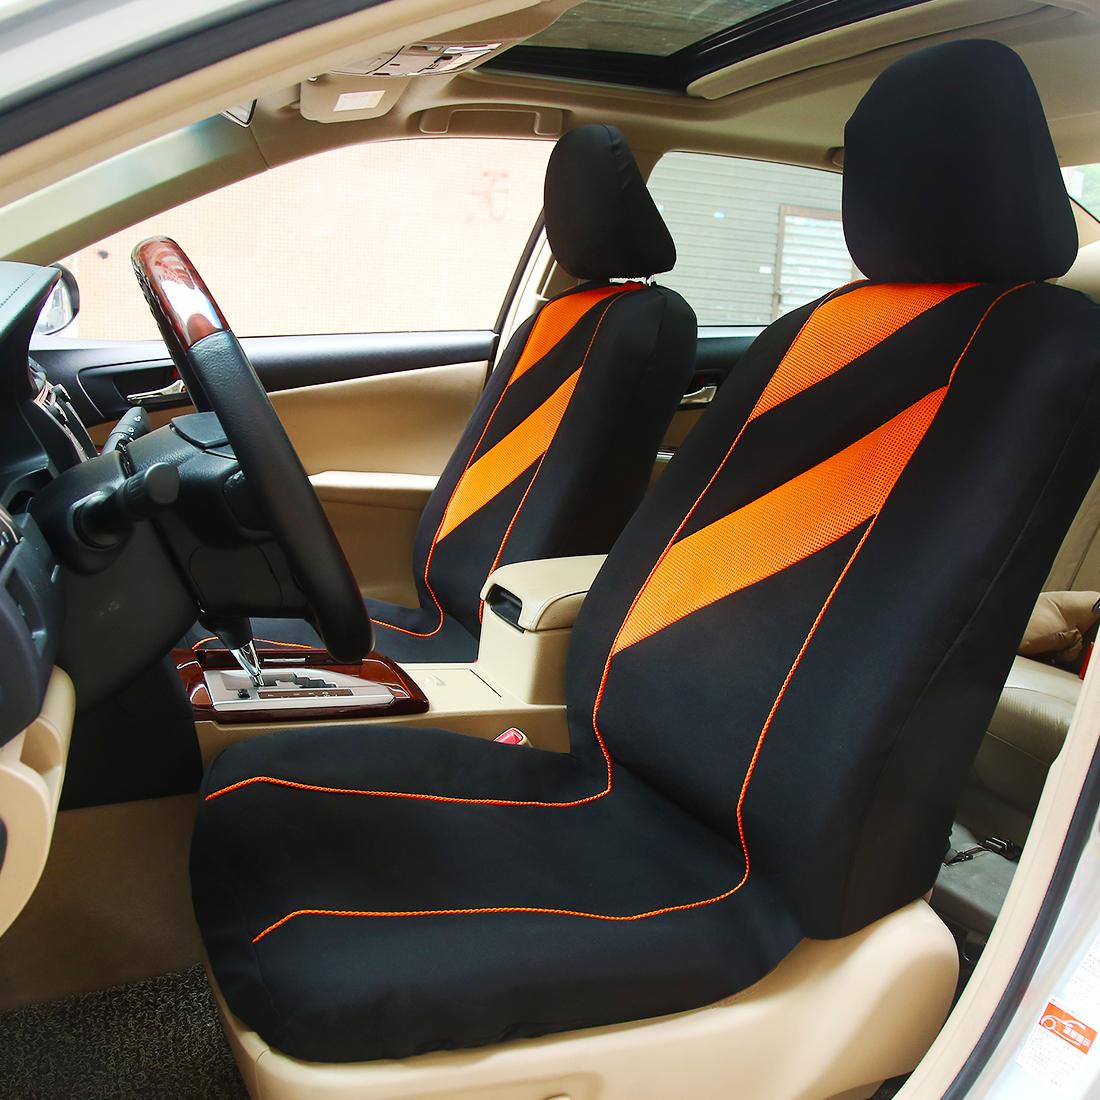 8pcs auto interior accessories car seat cover full set beige ebay. Black Bedroom Furniture Sets. Home Design Ideas